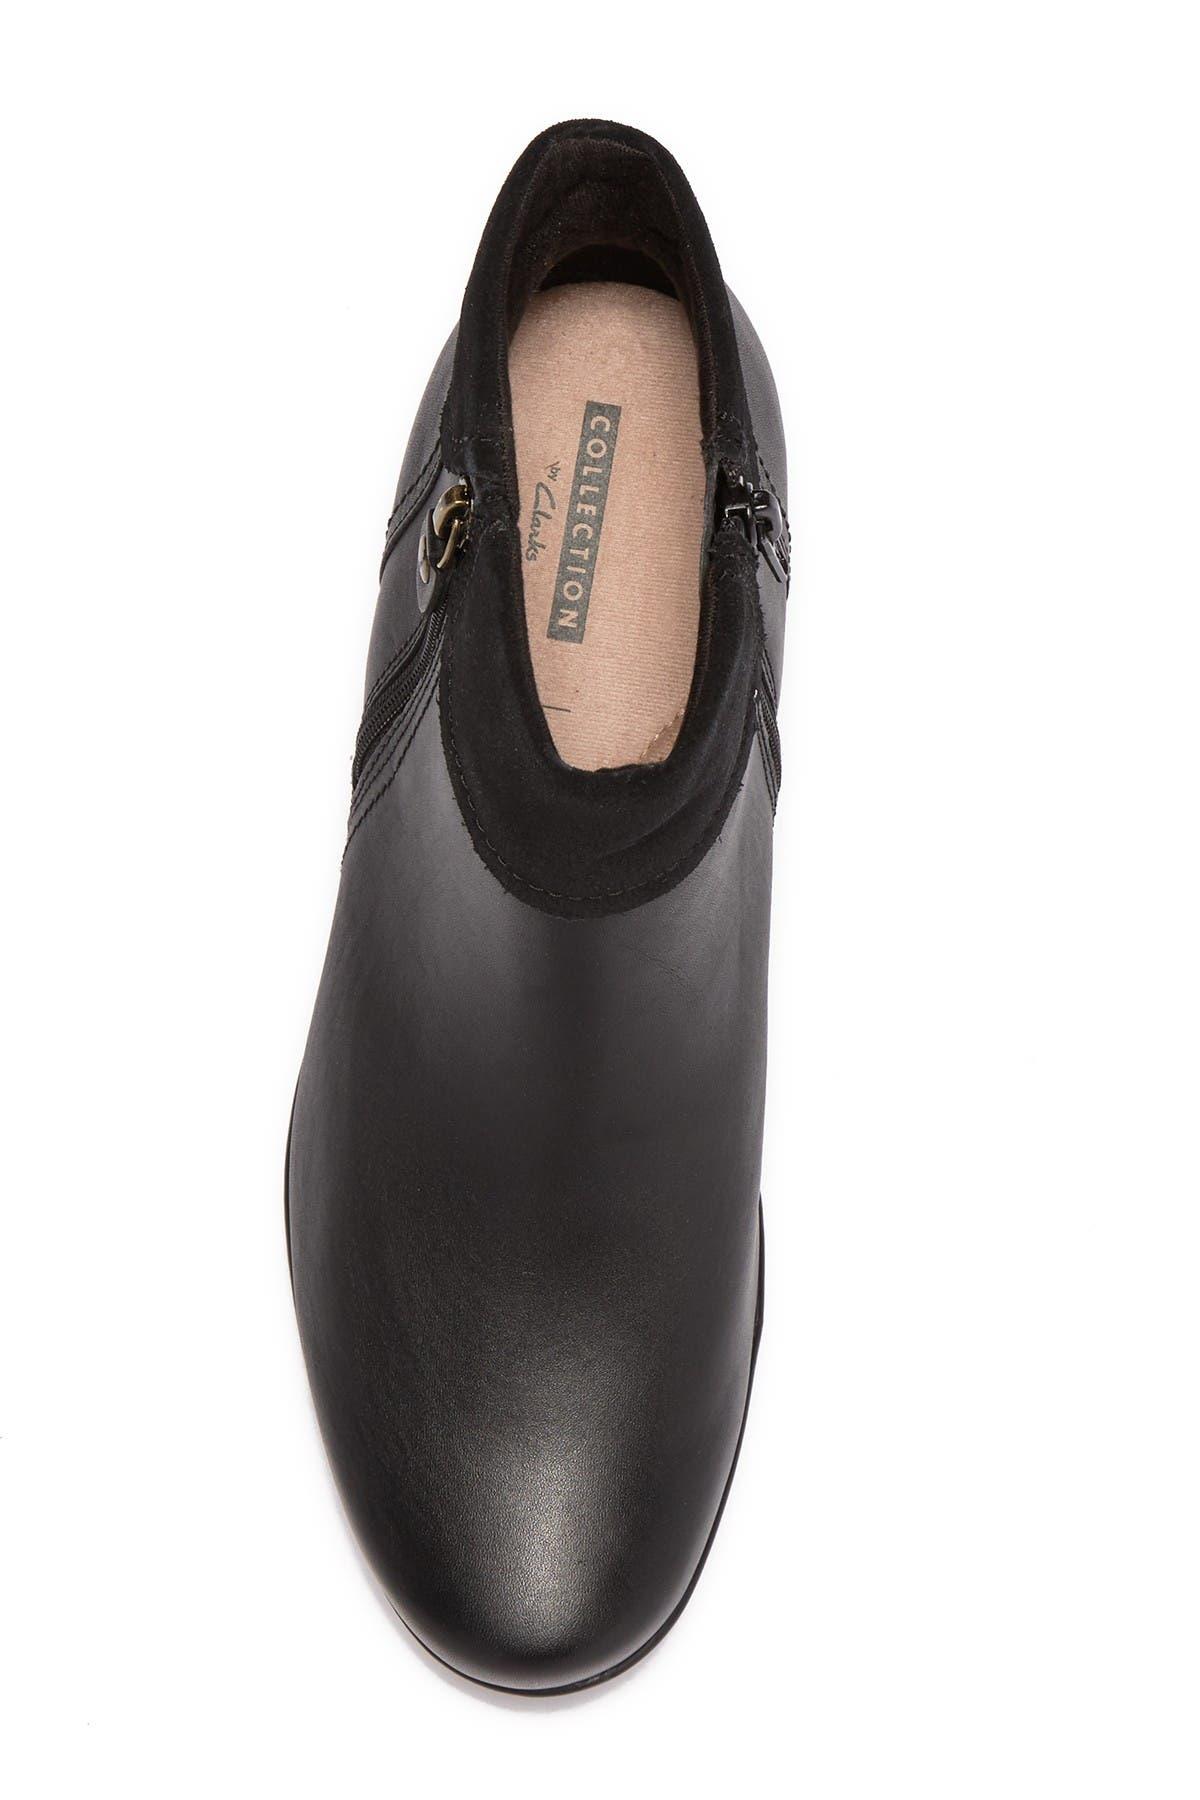 Clarks | Emslie Twist Leather Ankle